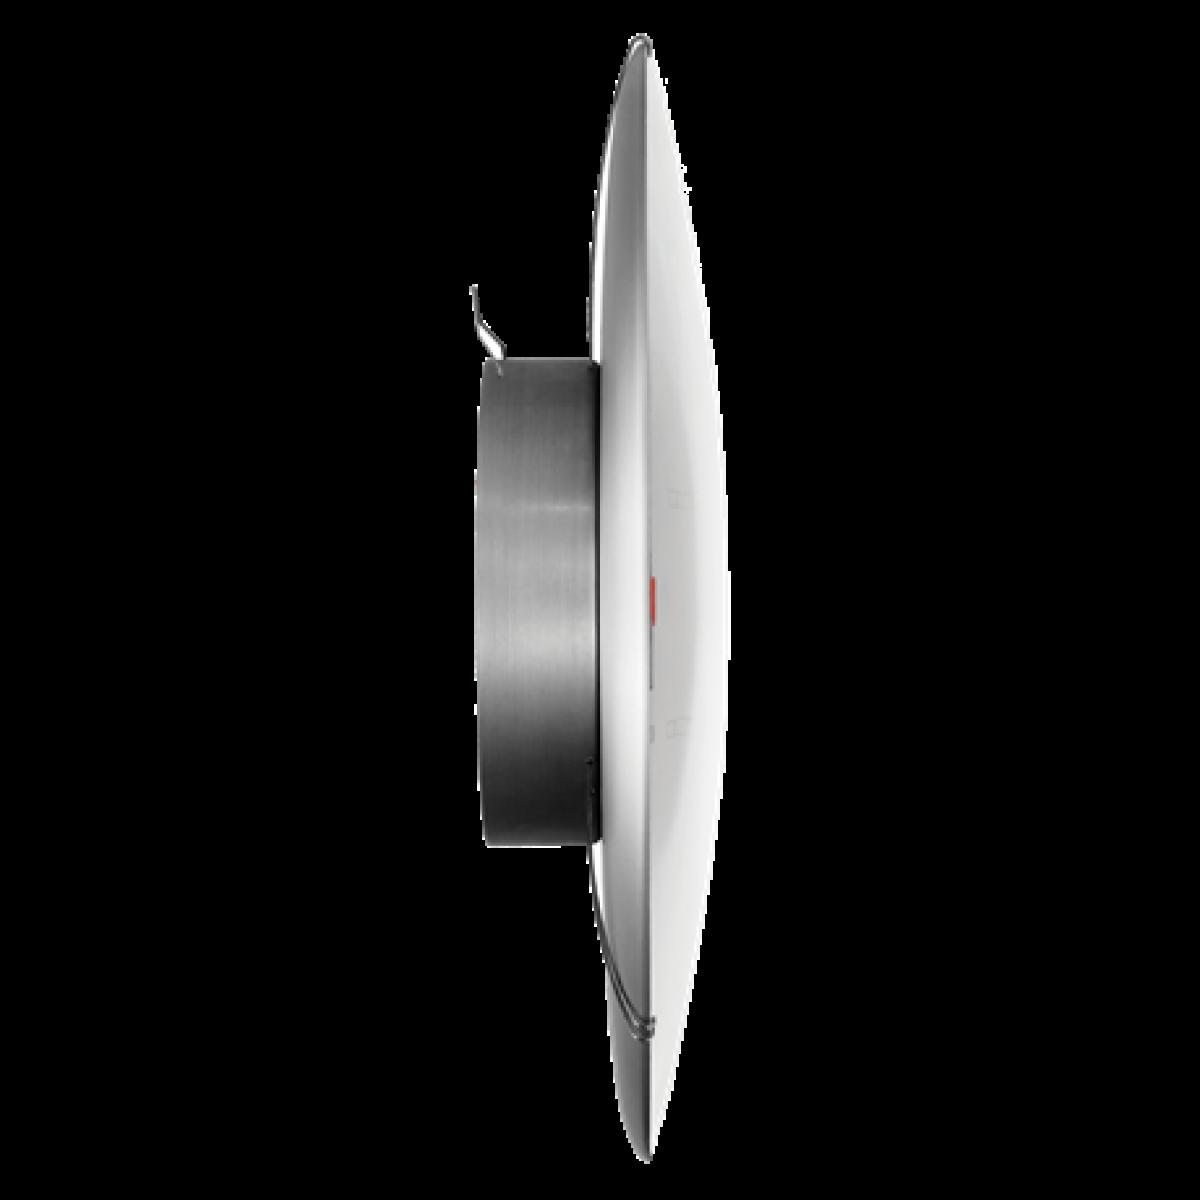 ARNEJACOBSENBankersvgur29cm-07